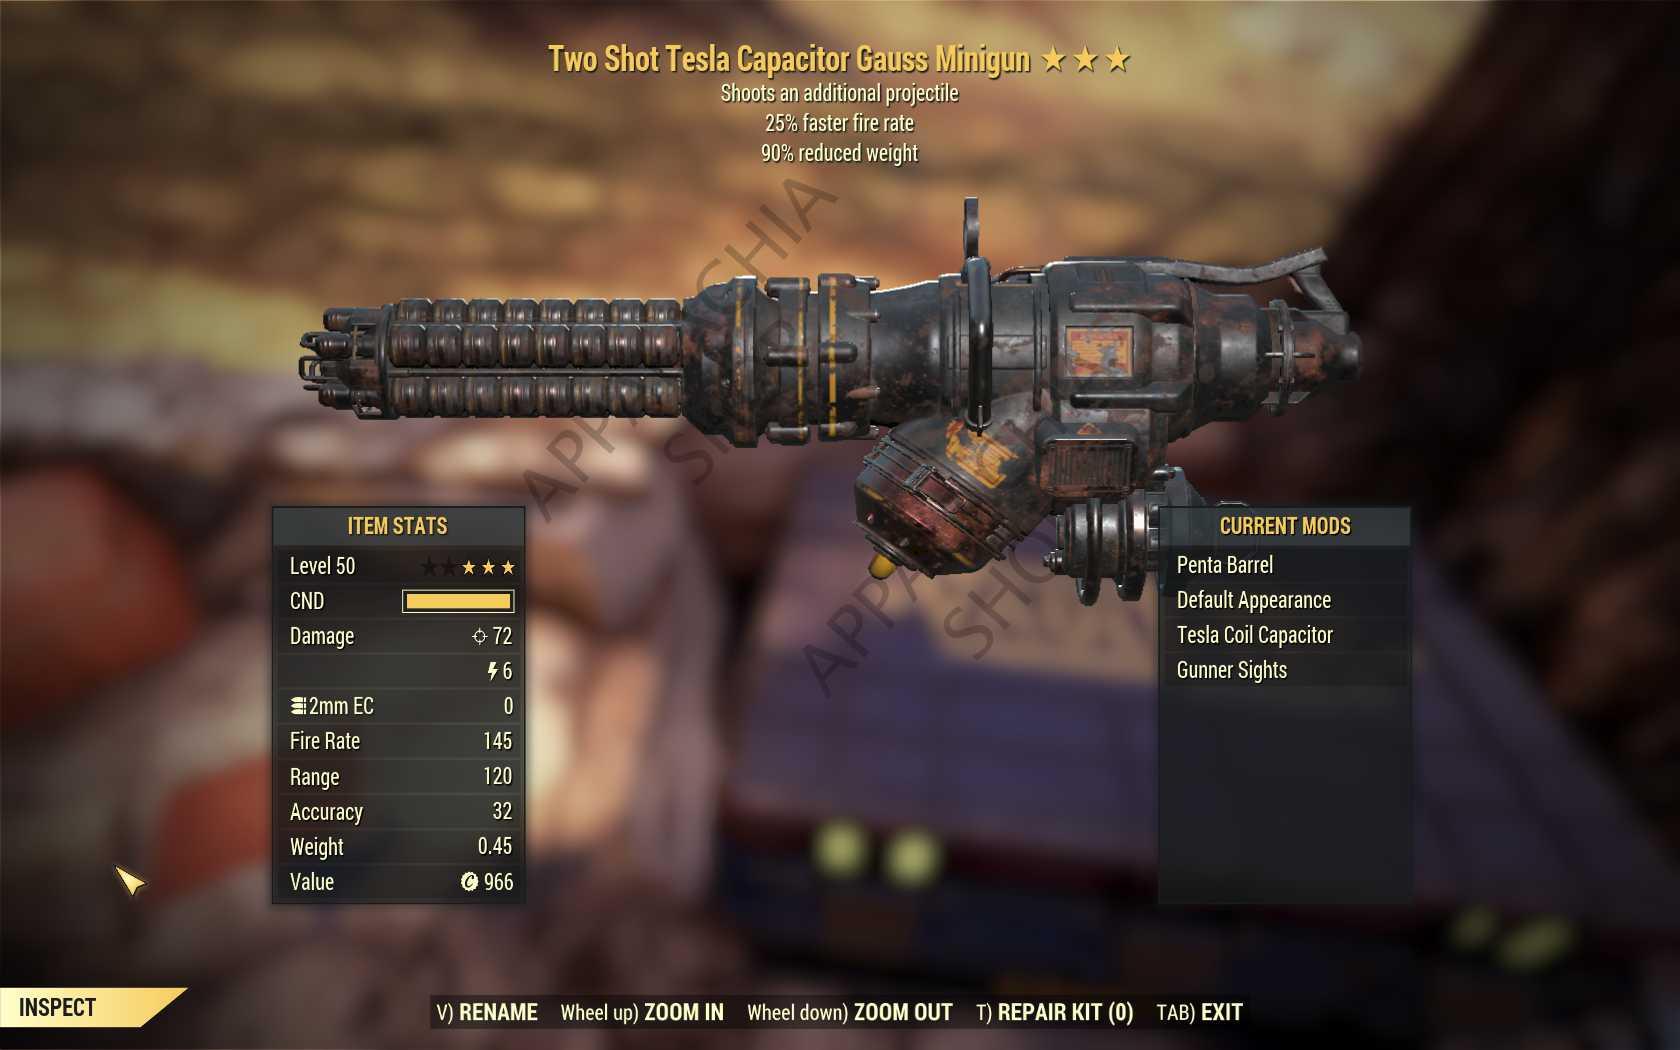 Two Shot Gauss Minigun (25% faster fire rate, 90% reduced weight) FULL MODDED [Wastelanders]